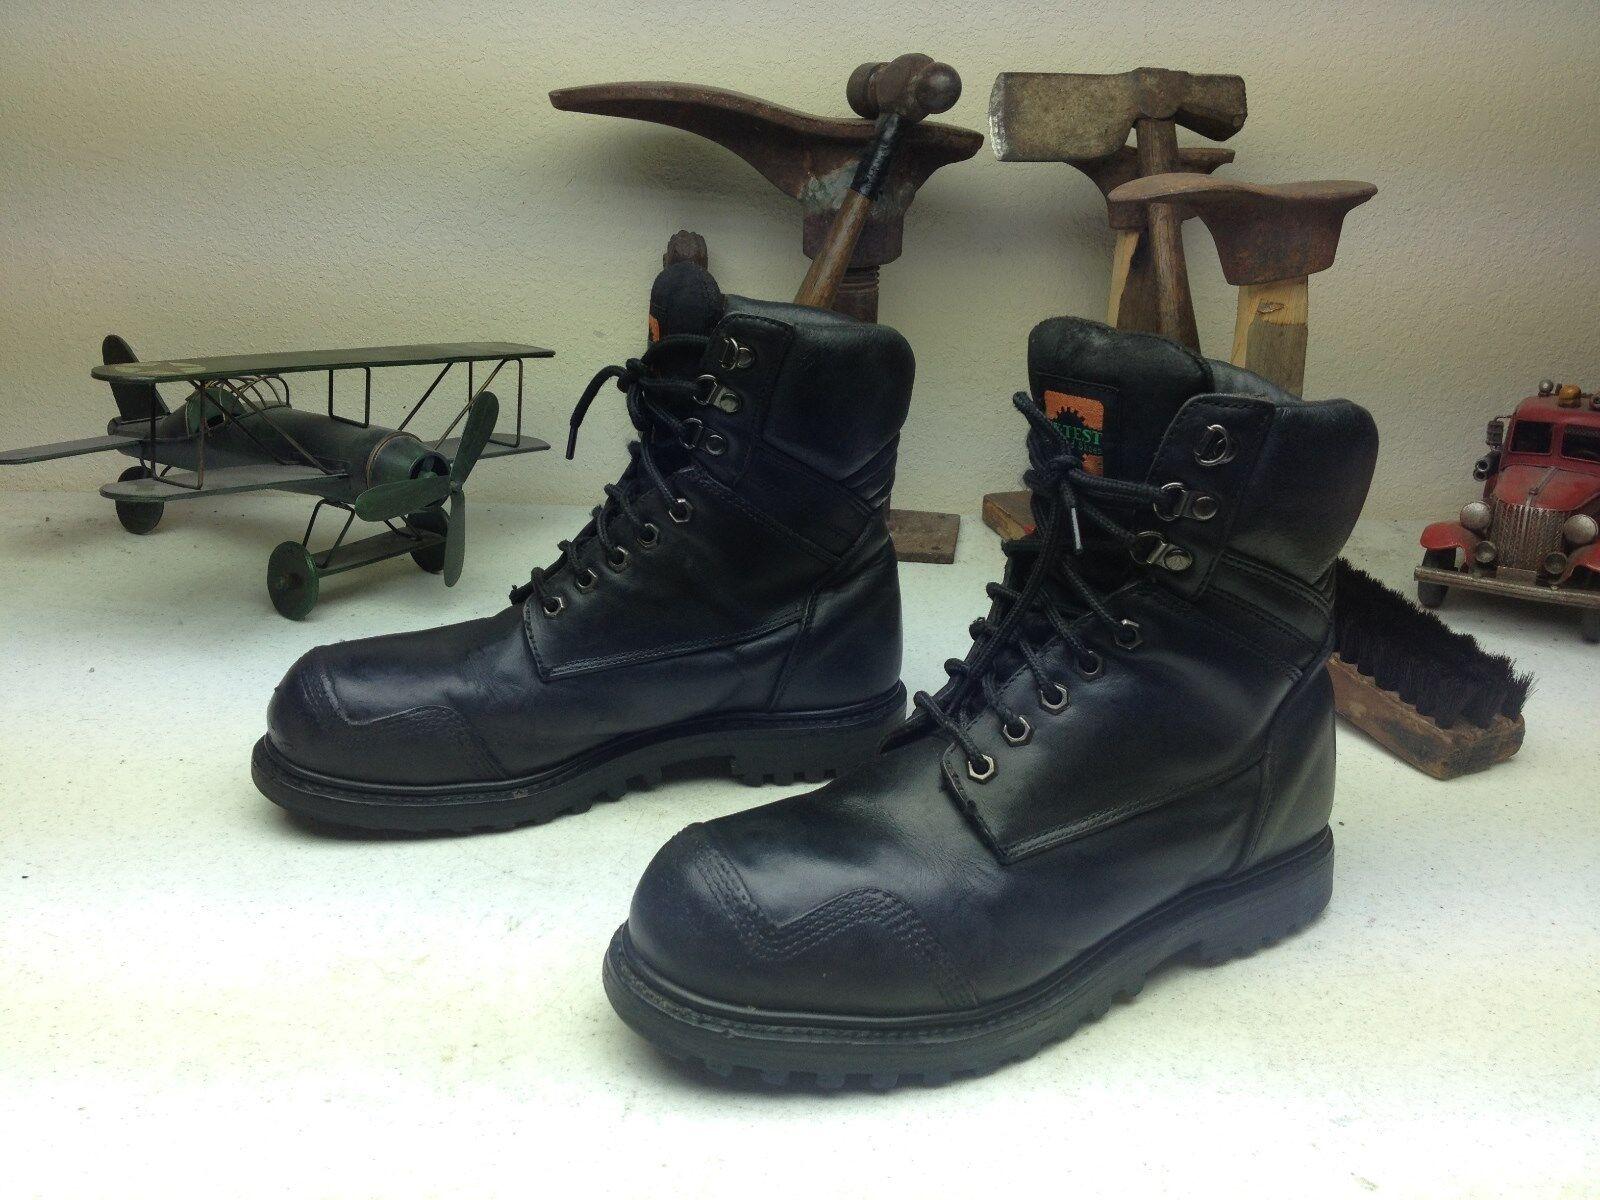 Hy-test Puntera De Acero Moto Militar Ingeniero Cuero Negro Boss botas 8.5 M